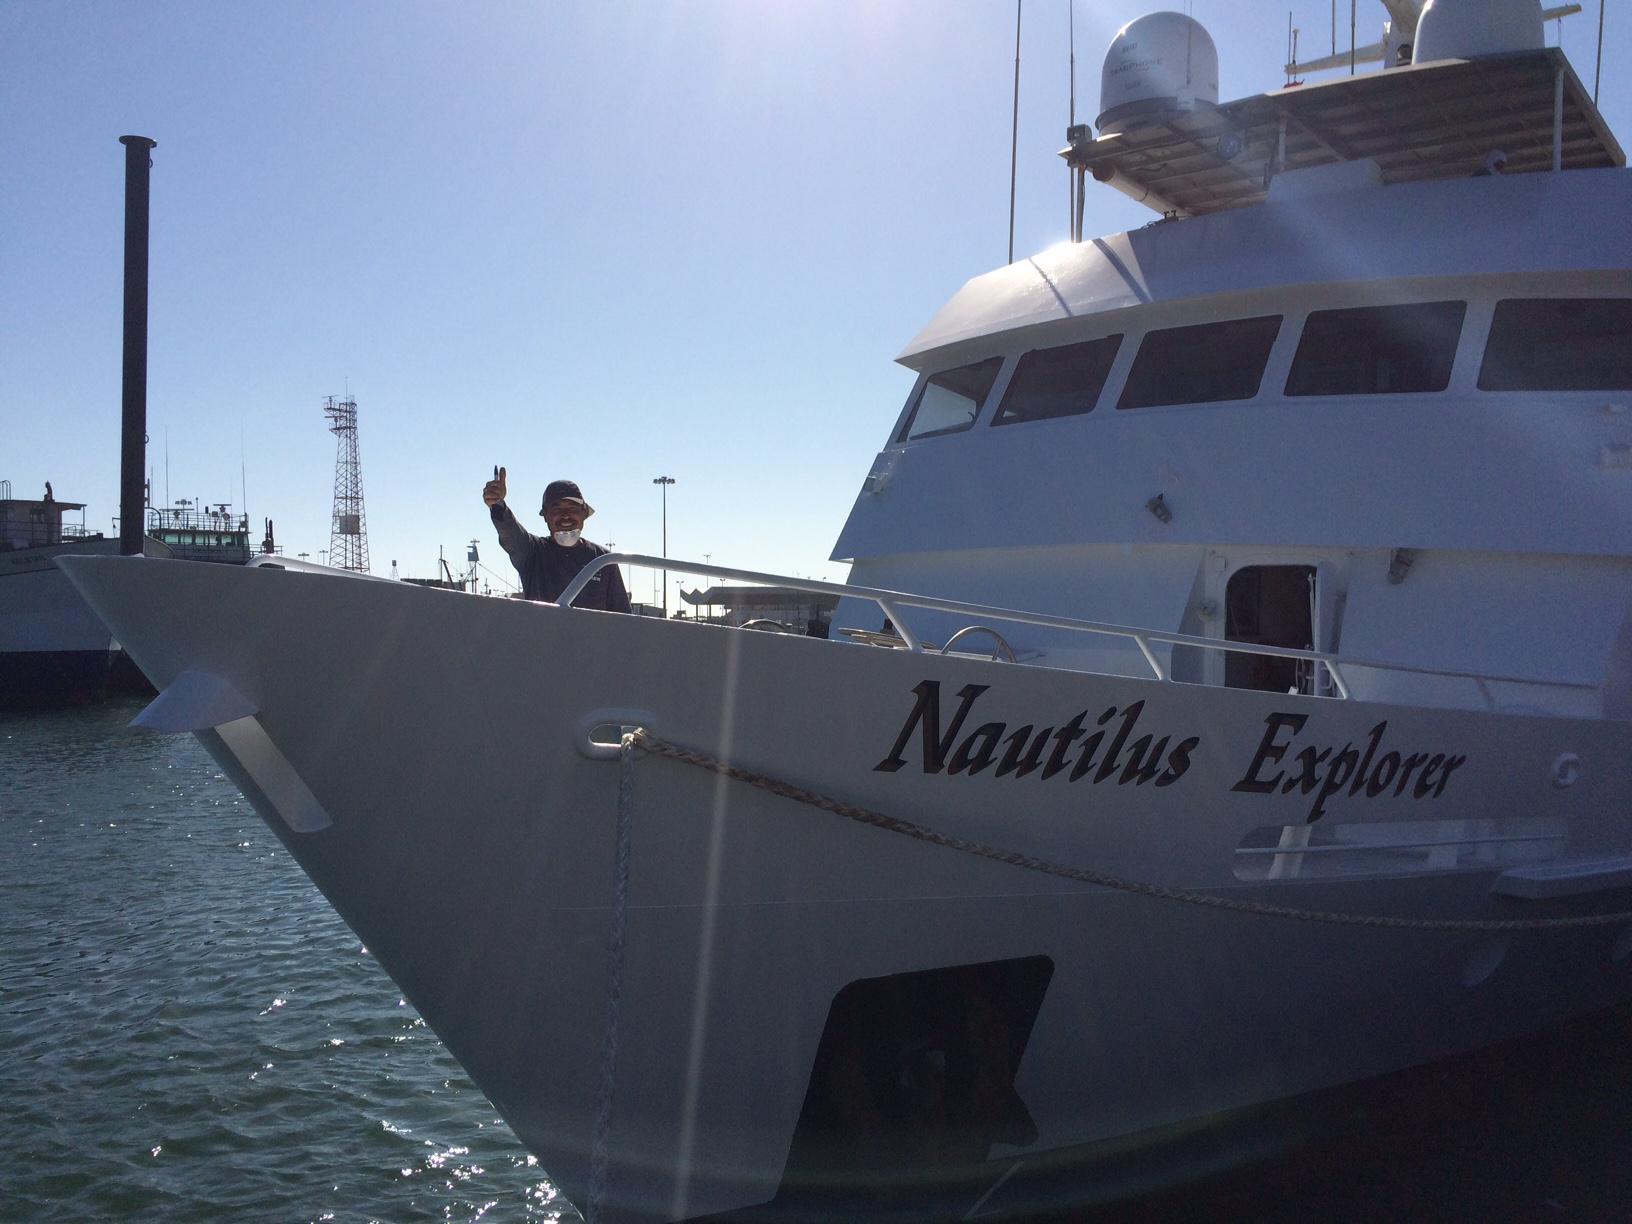 Hernan on the Nautilus Explorer